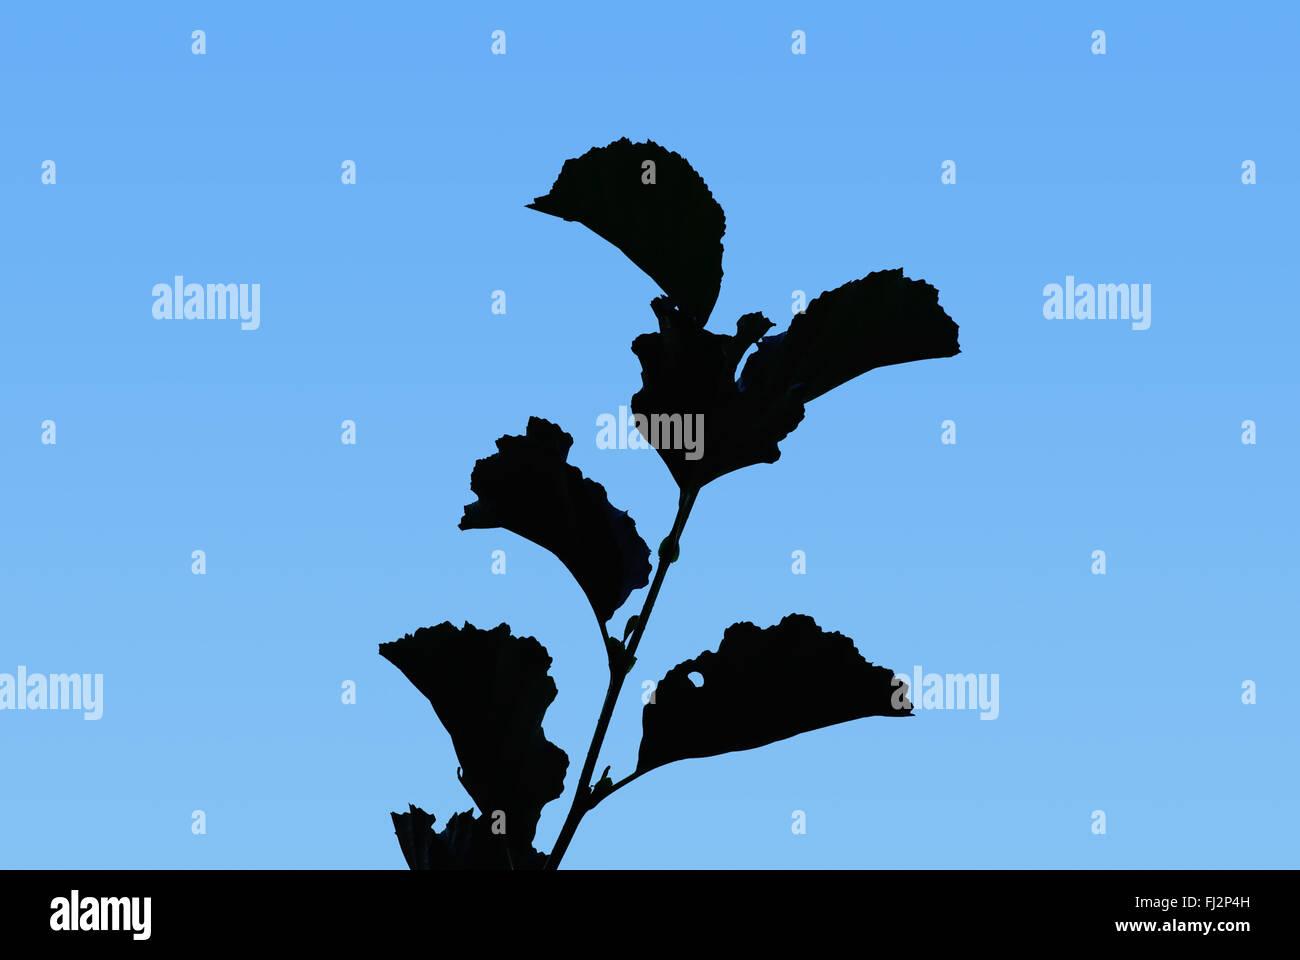 PLANT SILHOUETTE - Stock Image